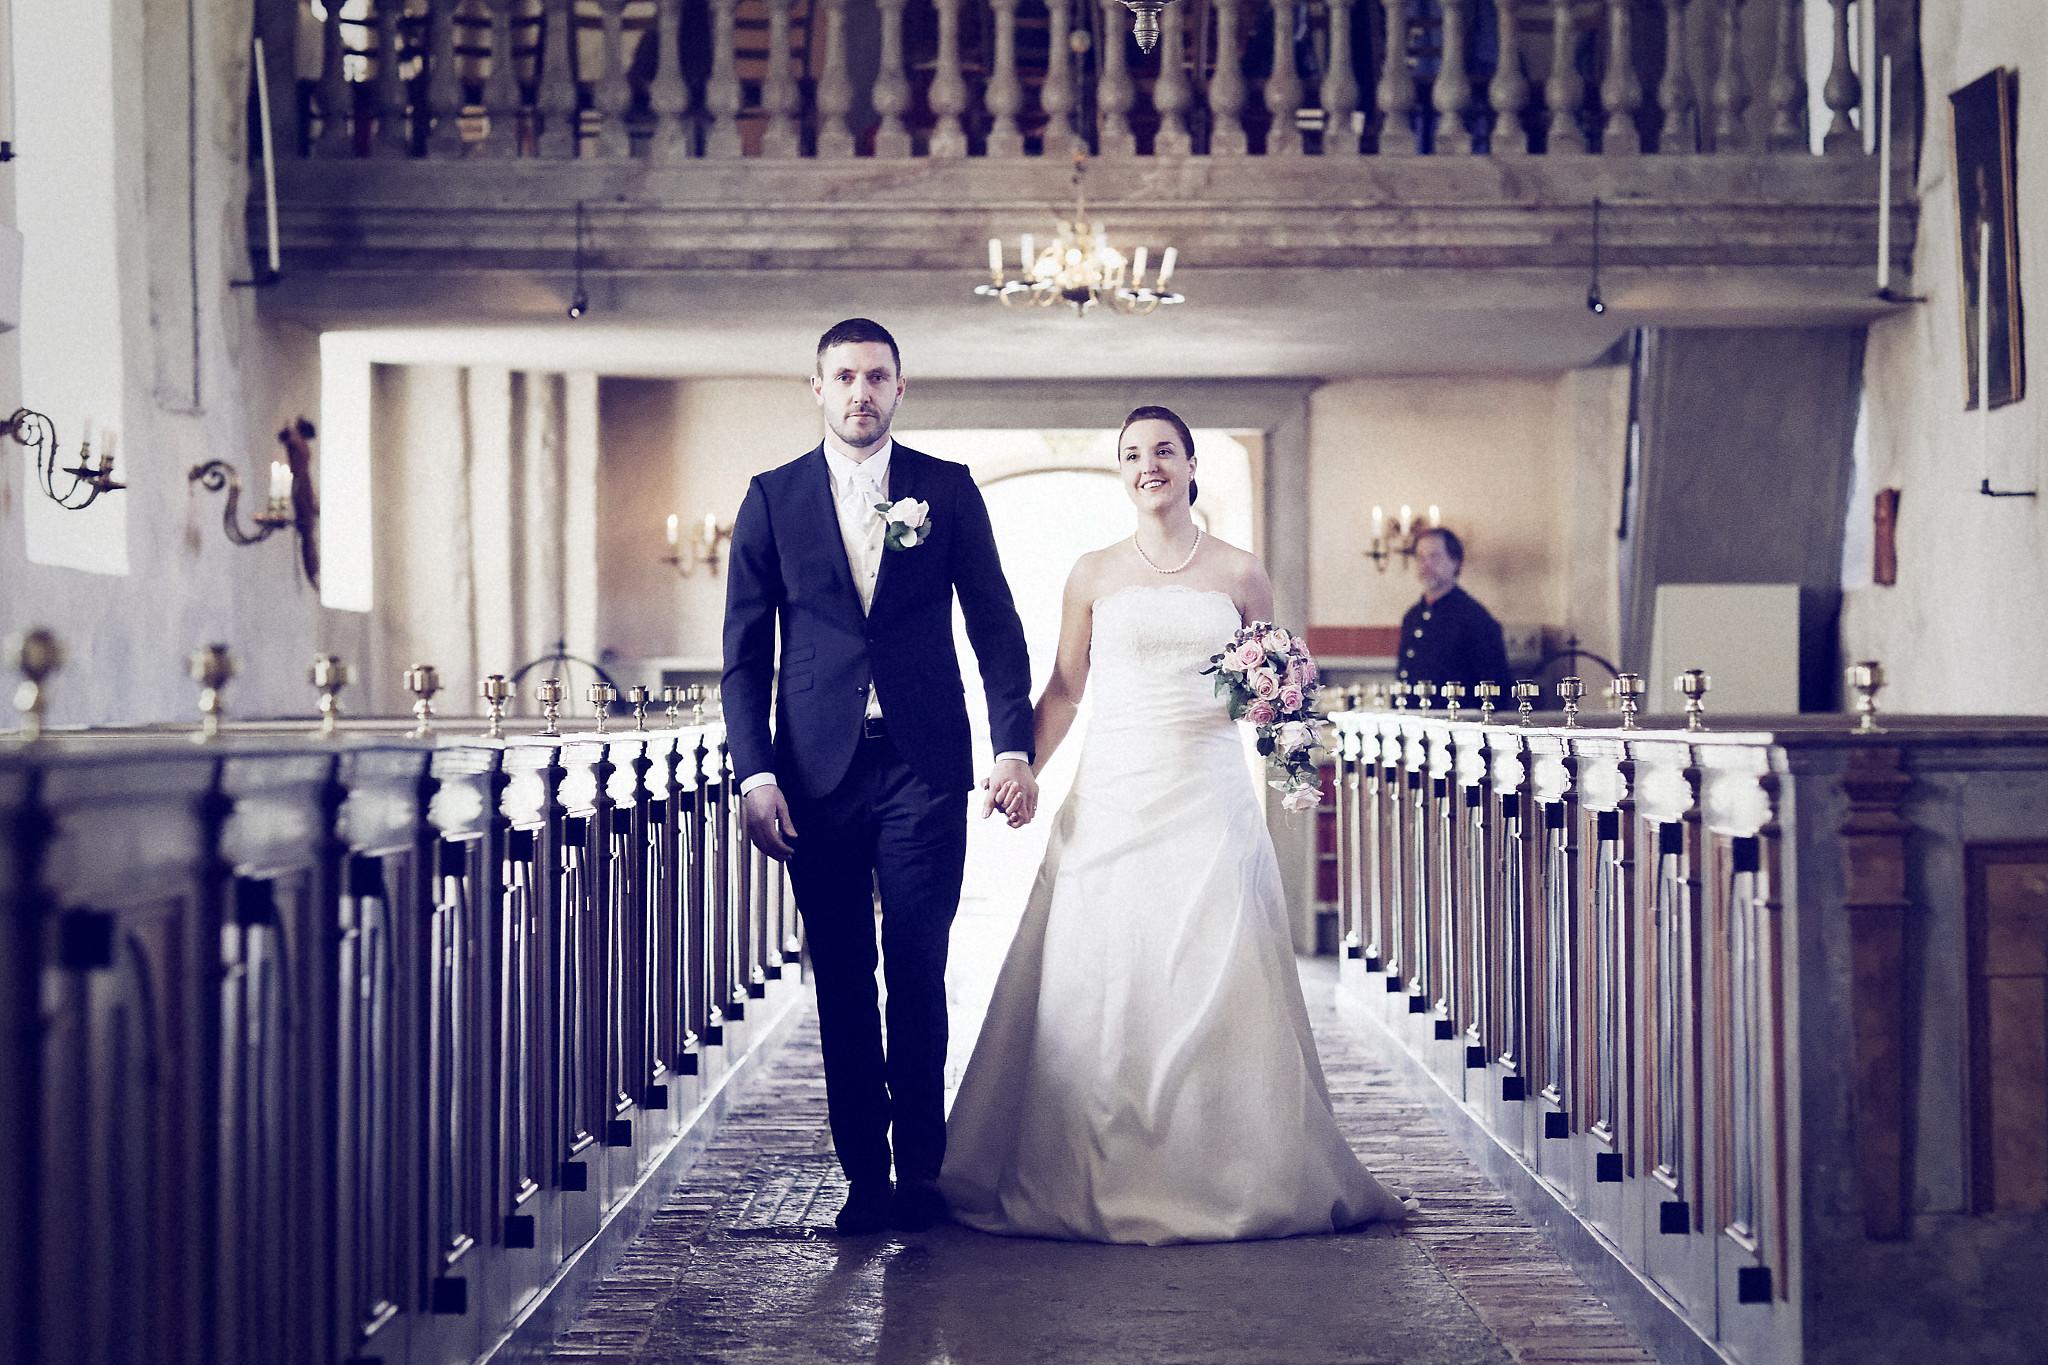 Bröllopsceremoni 1: Caroline/Tobias